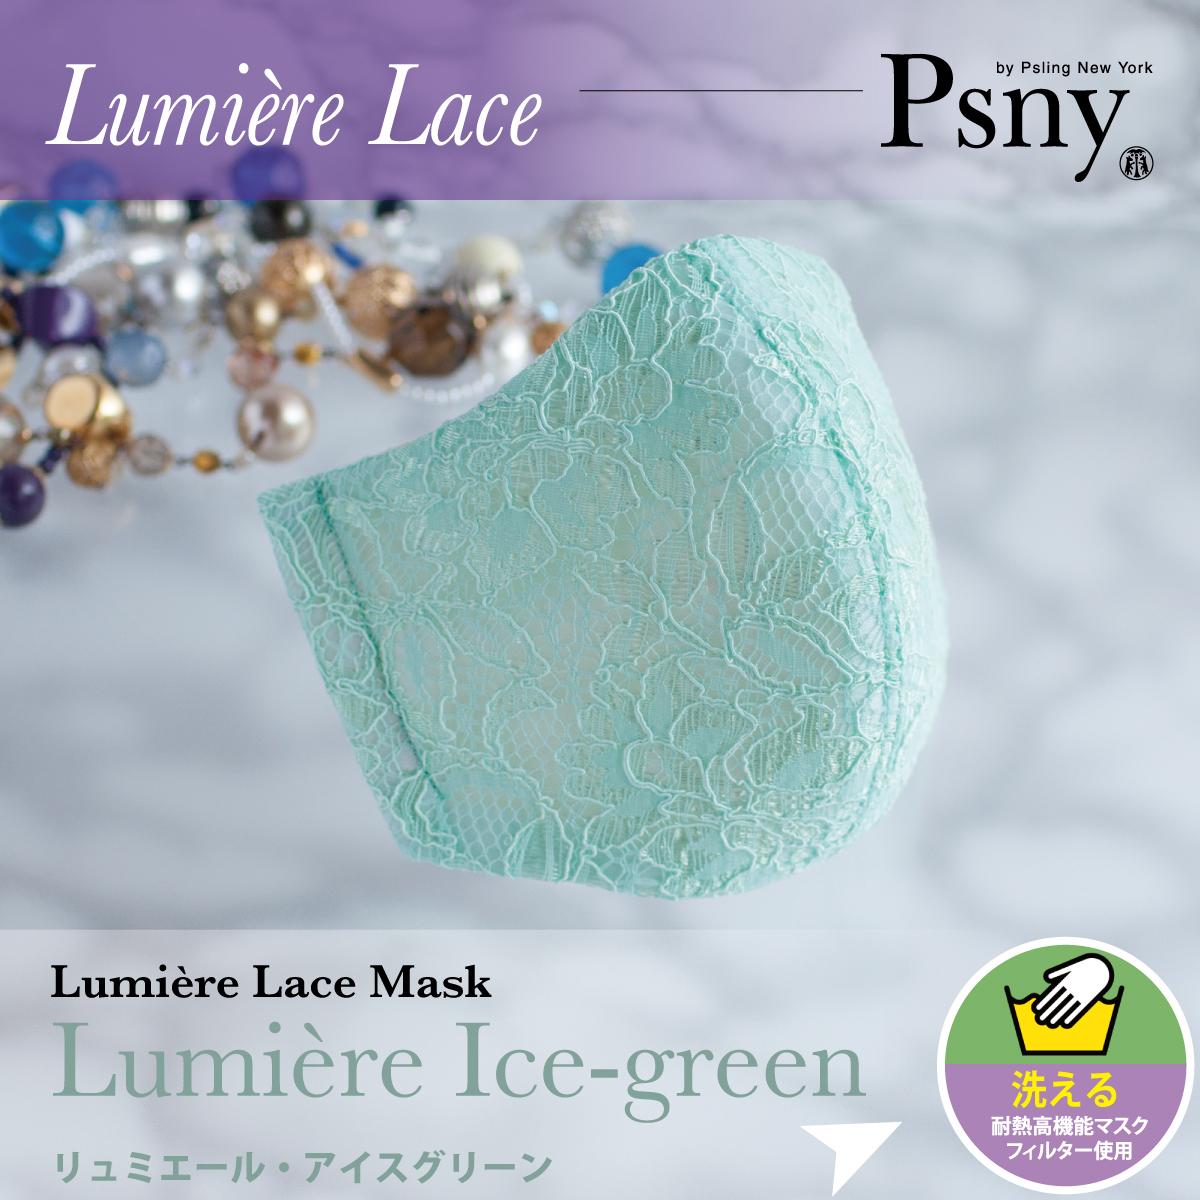 PSNY リュミエール レース・アイスグリーン 花粉 黄砂 洗える不織布フィルター入り 立体 大人用 美しい マスク 送料無料 LM6